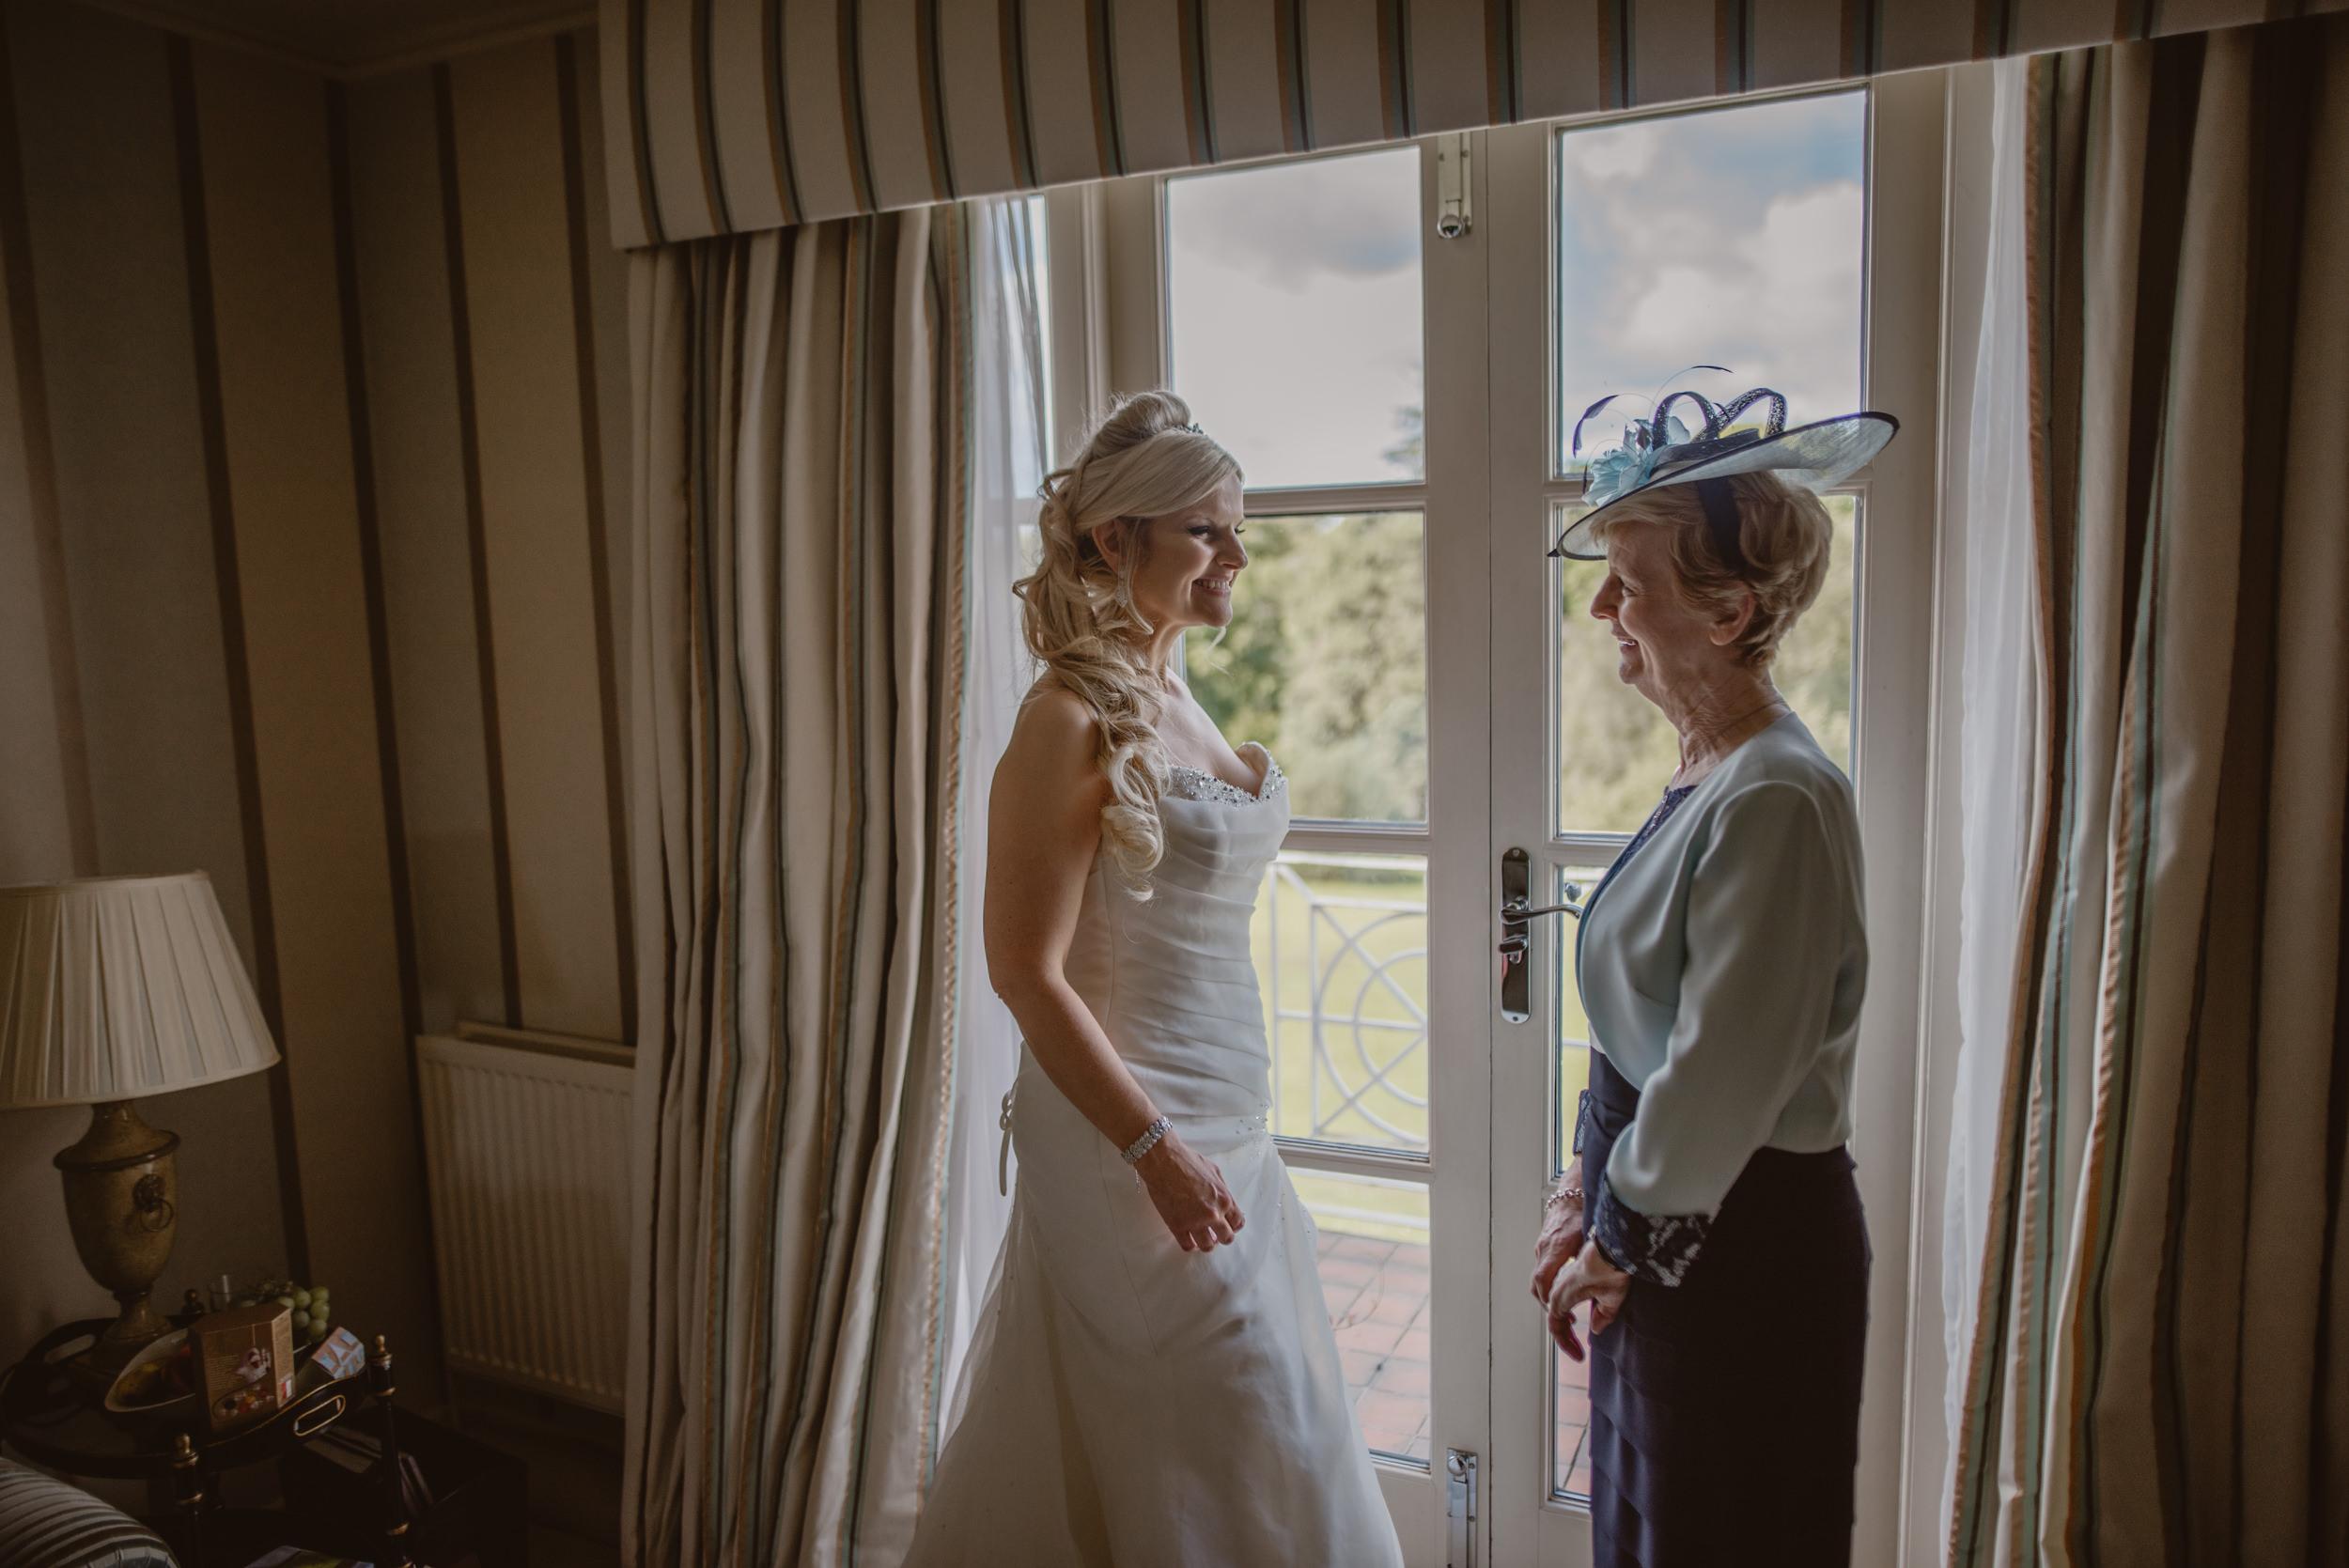 Trisha-and-Roger-wedding-The-Priory-Church-and-Chewton-Glen-Hotel-Christchurch-Manu-Mendoza-Wedding-Photography-073.jpg